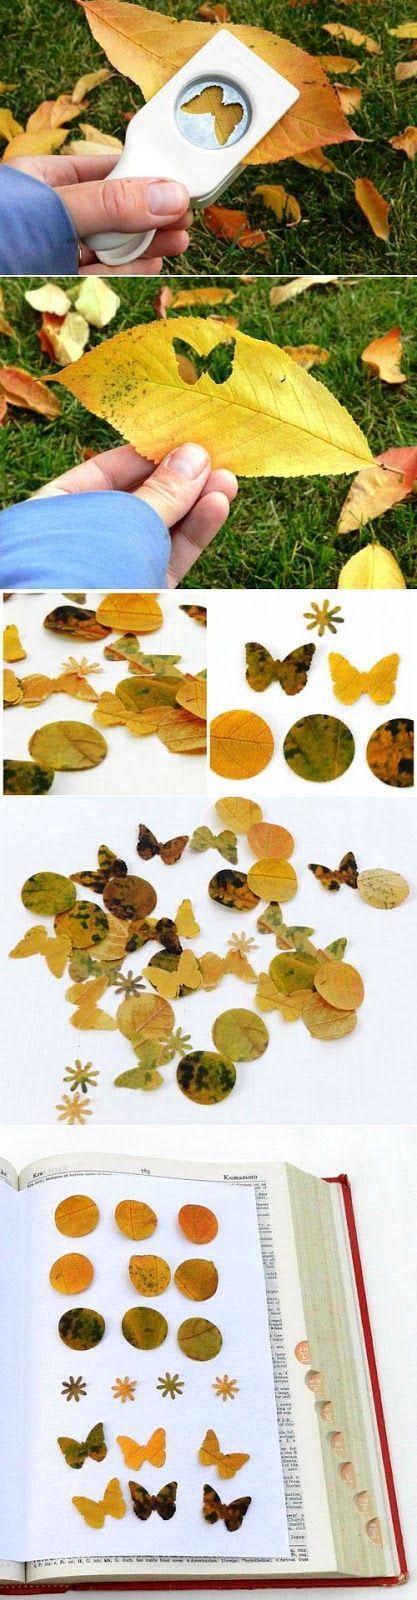 303Pixels: Leaf cut outs